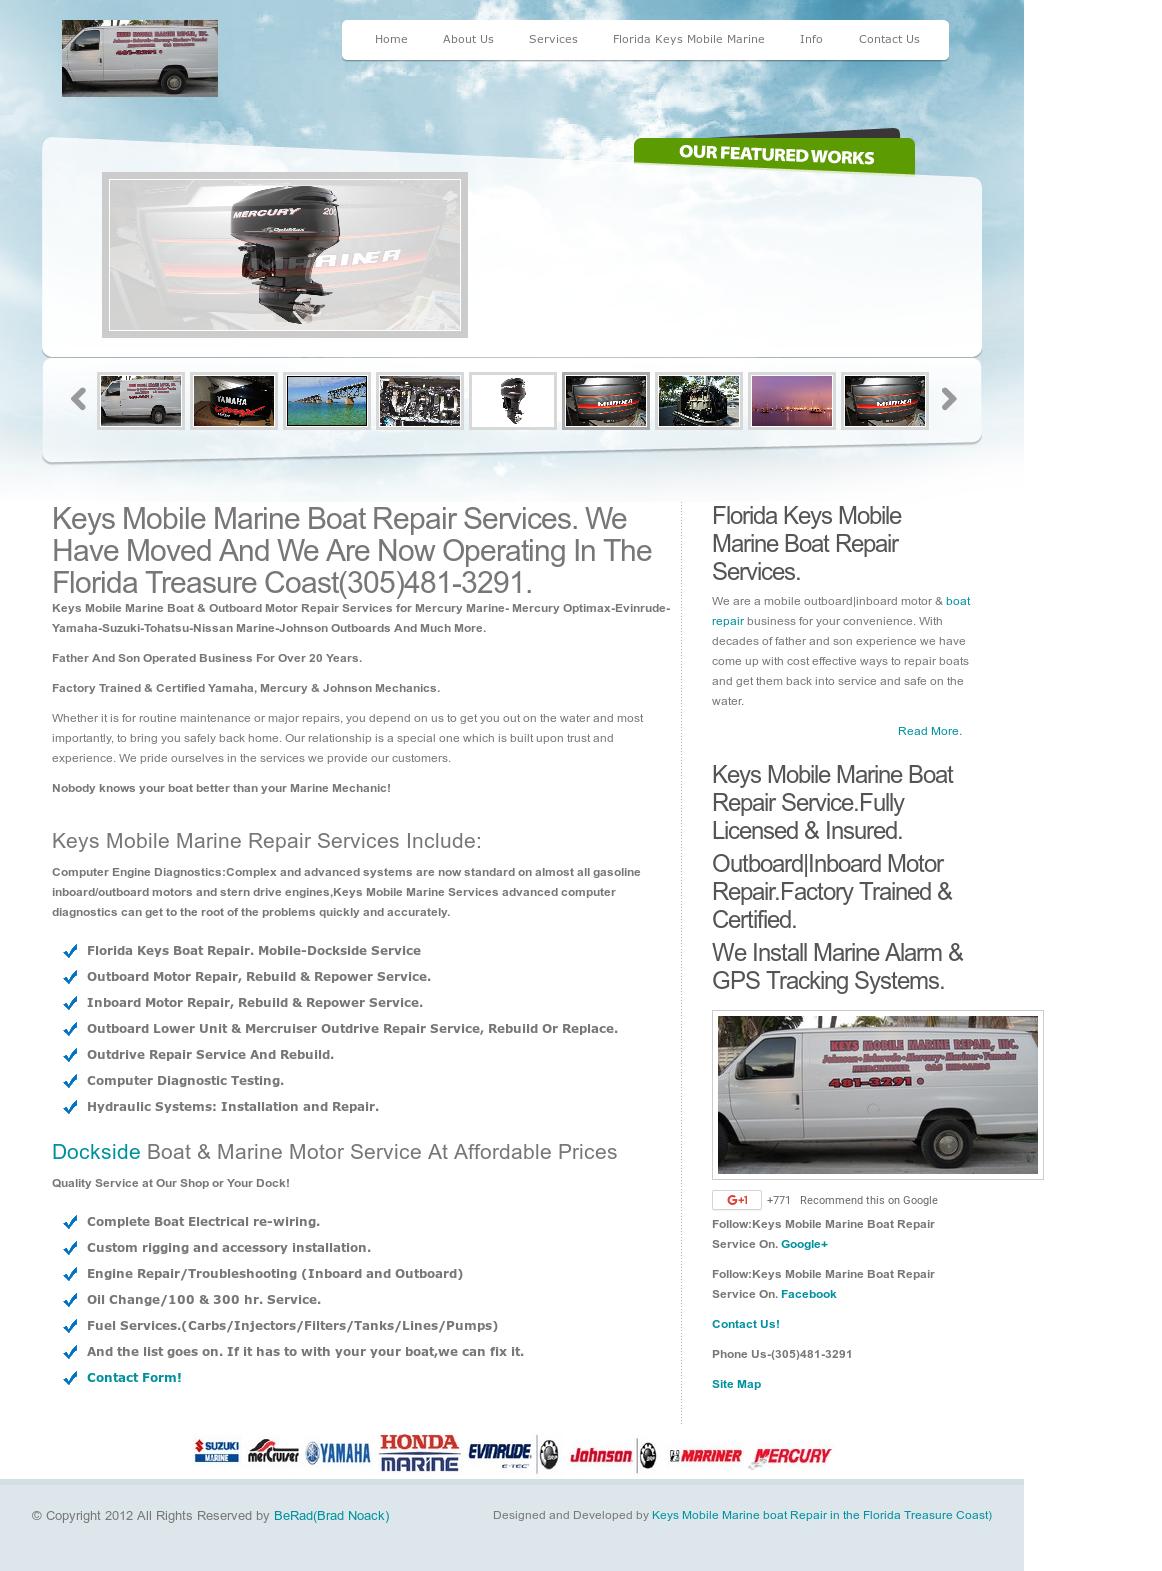 Keys Mobile Marine Repair Competitors, Revenue and Employees - Owler